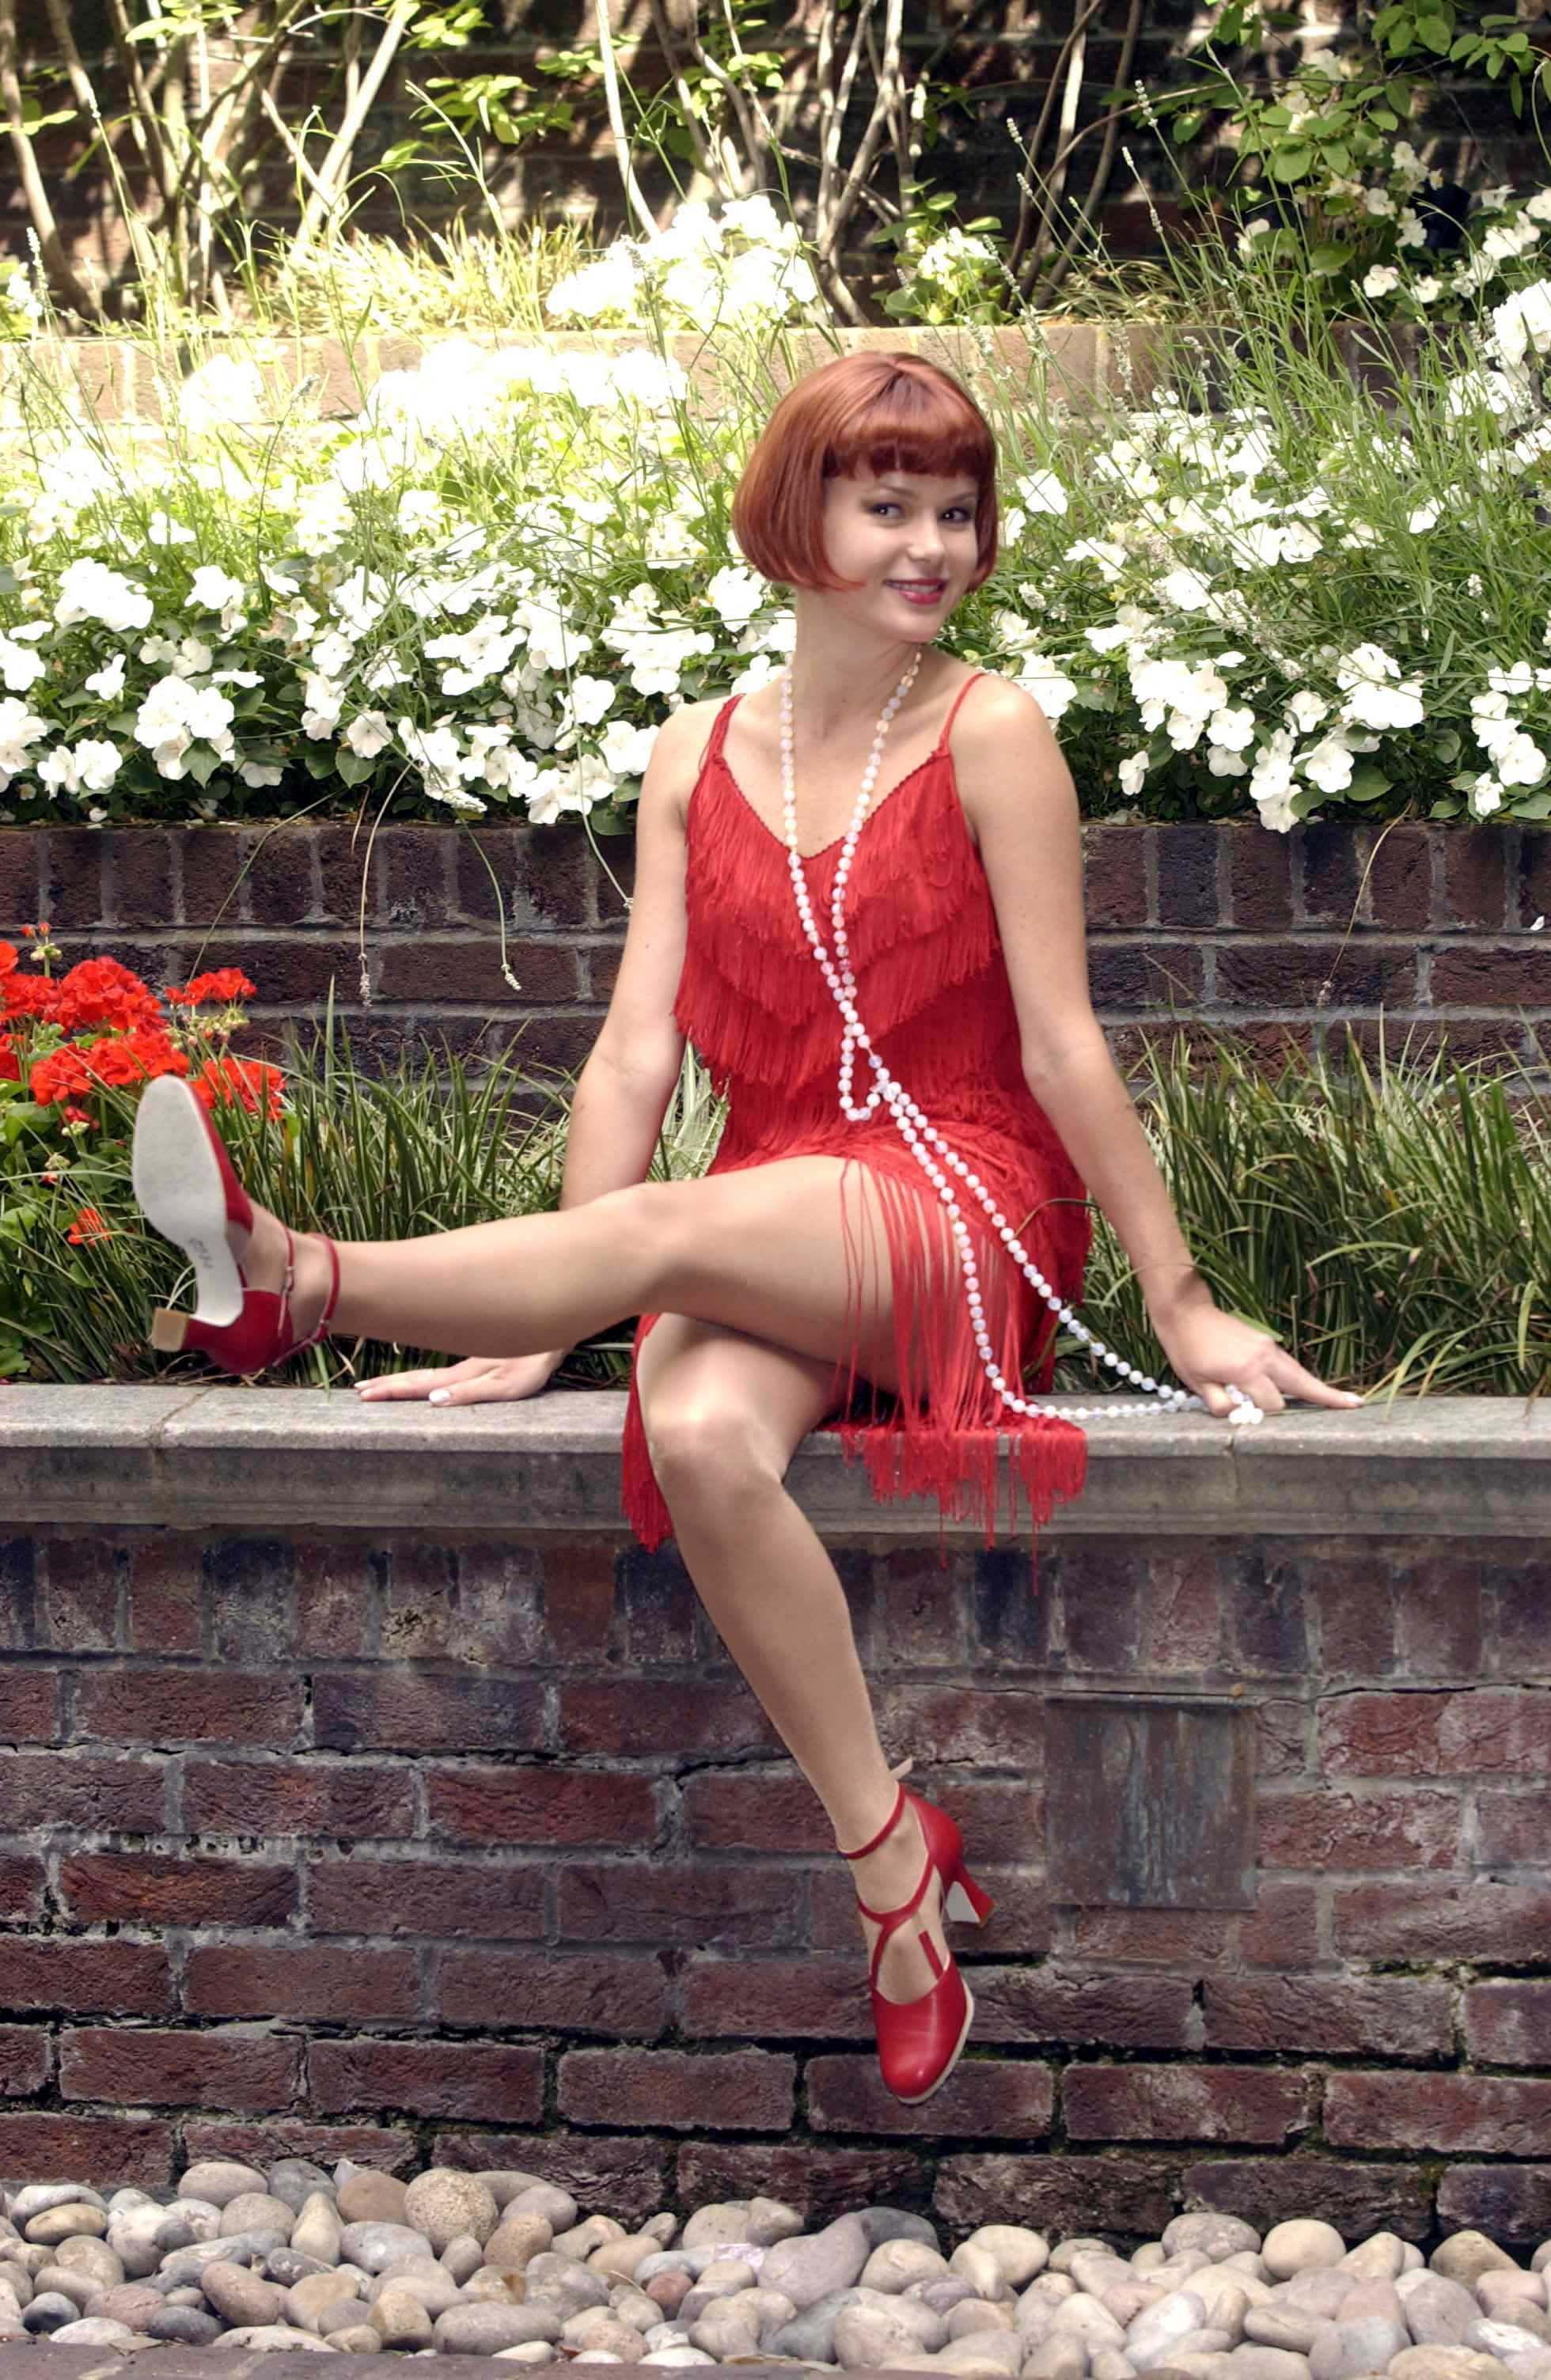 Amanda Holden Tape amanda holden – unknown photoshoot | amanda holden